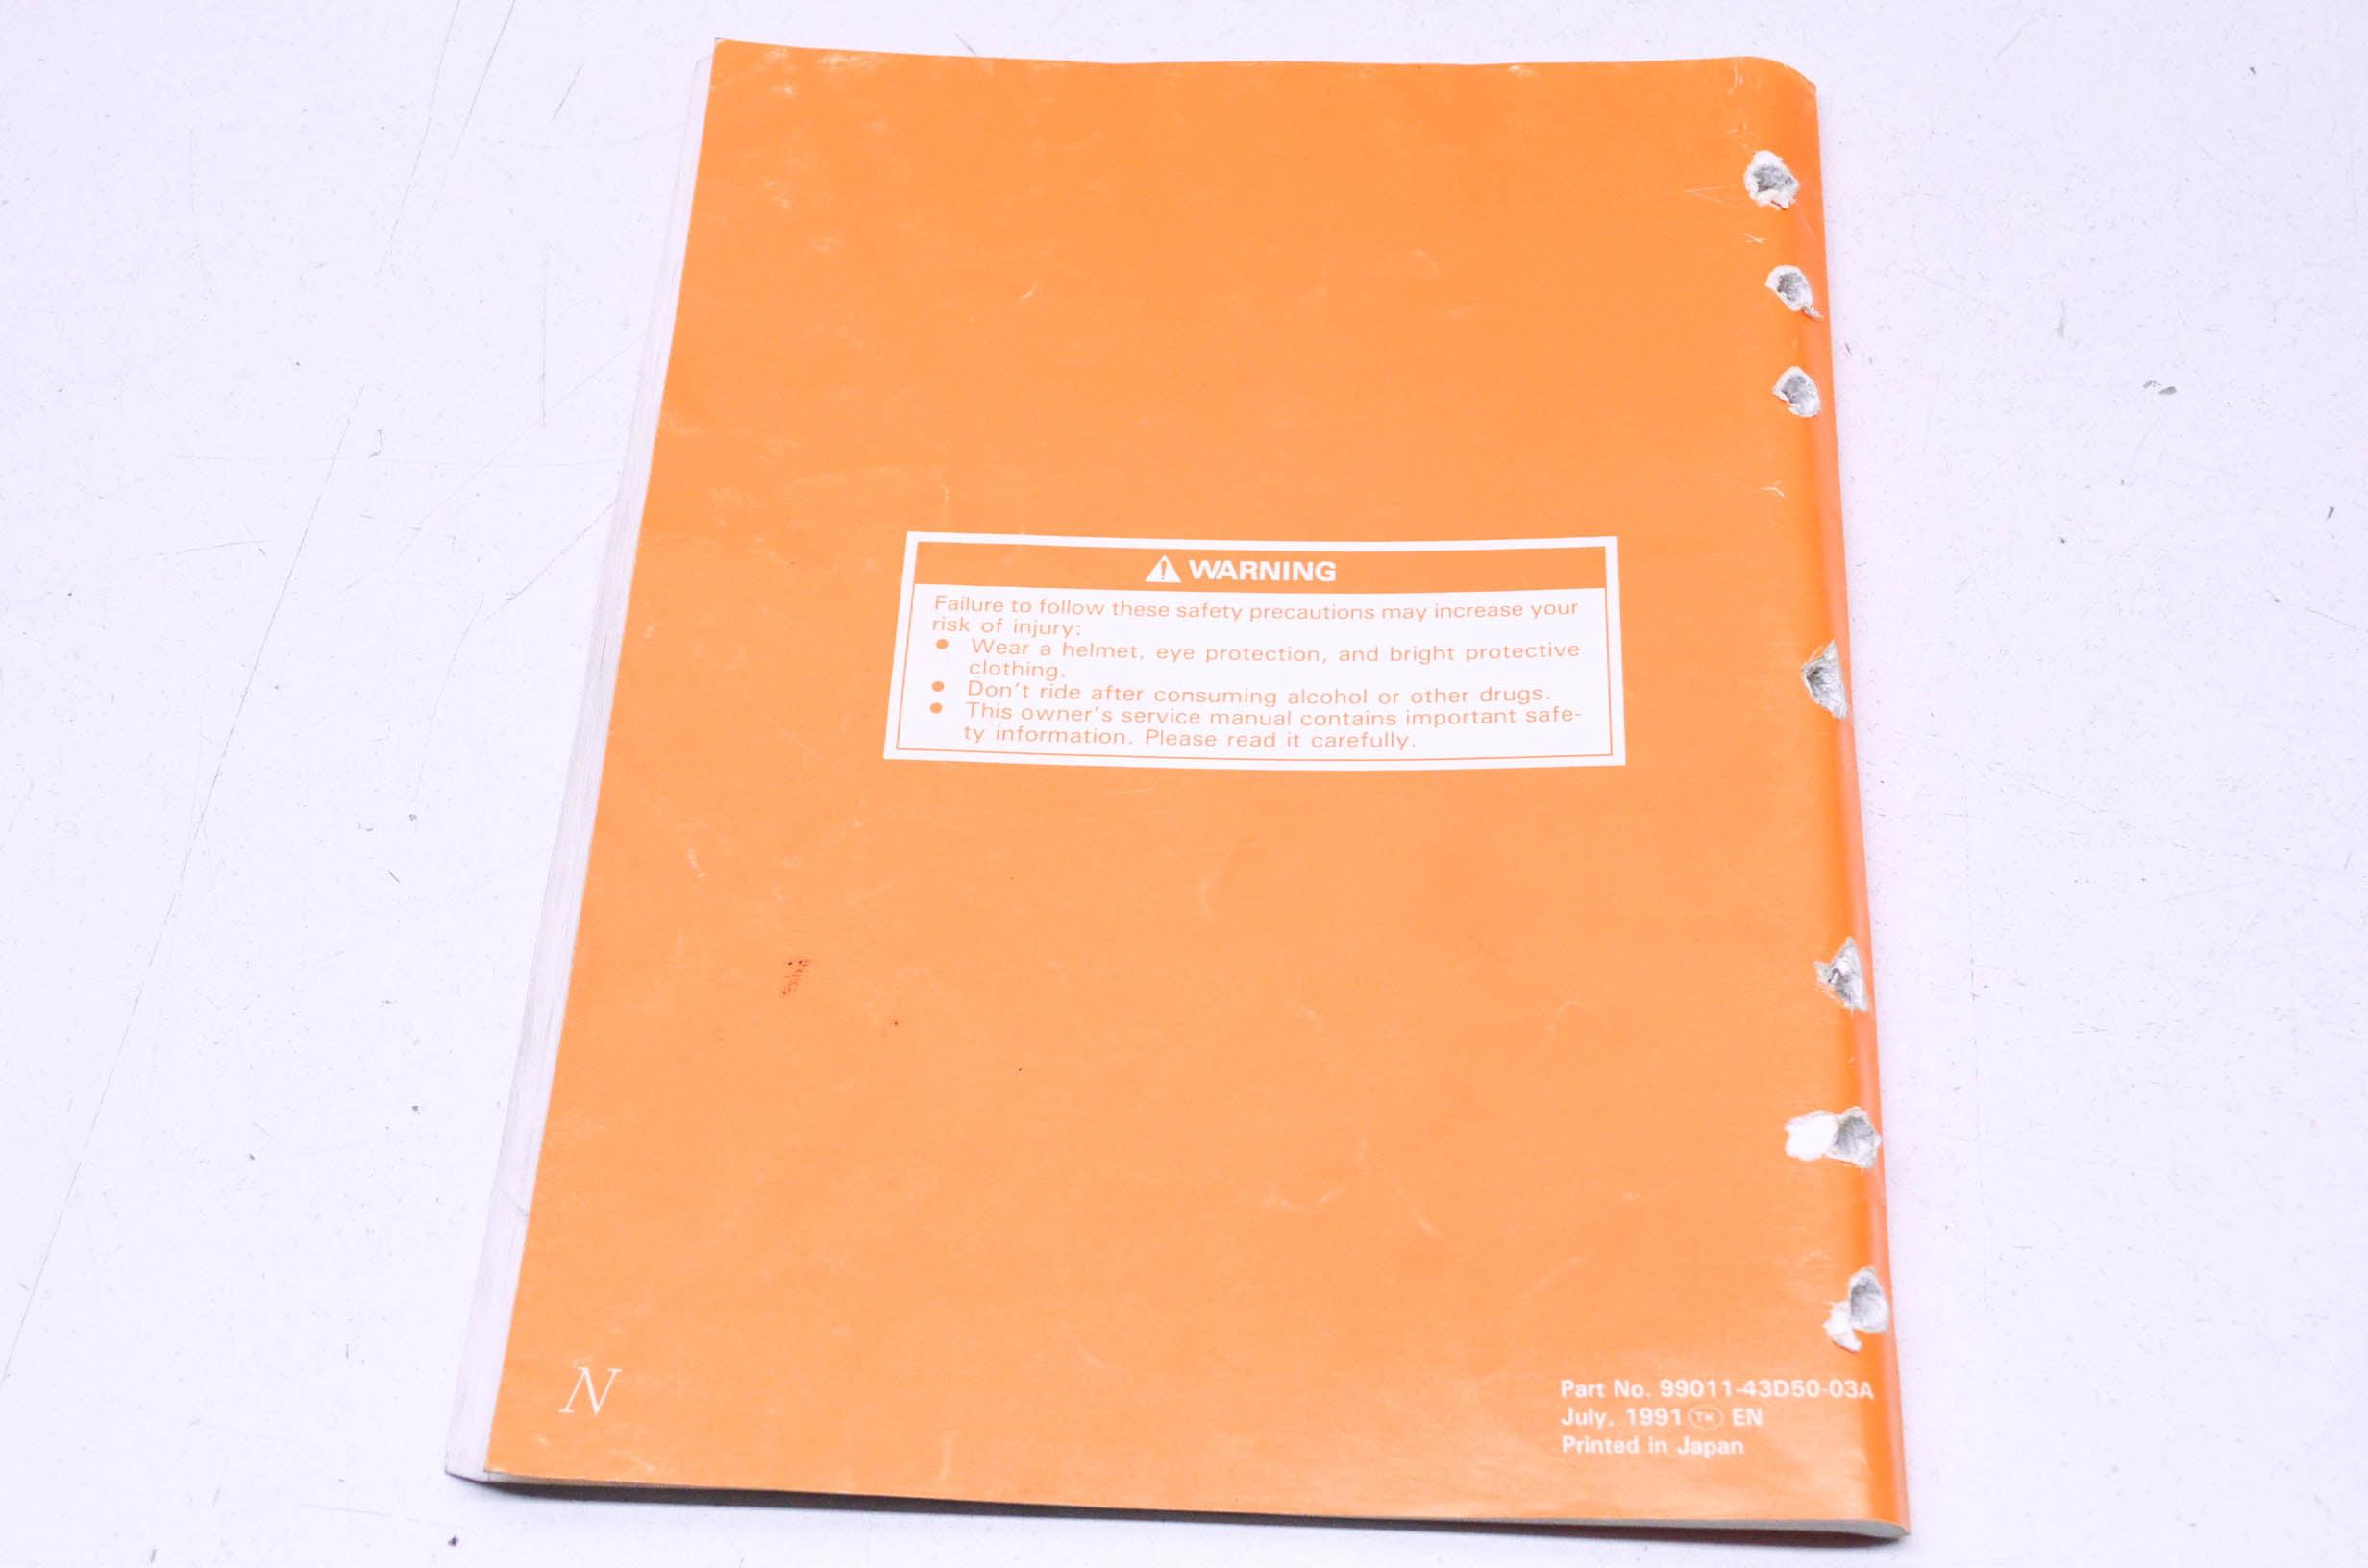 Suzuki 50 quad manual ebook array suzuki ltf250 manual ebook rh suzuki ltf250 manual ebook mollysmenu us fandeluxe Image collections